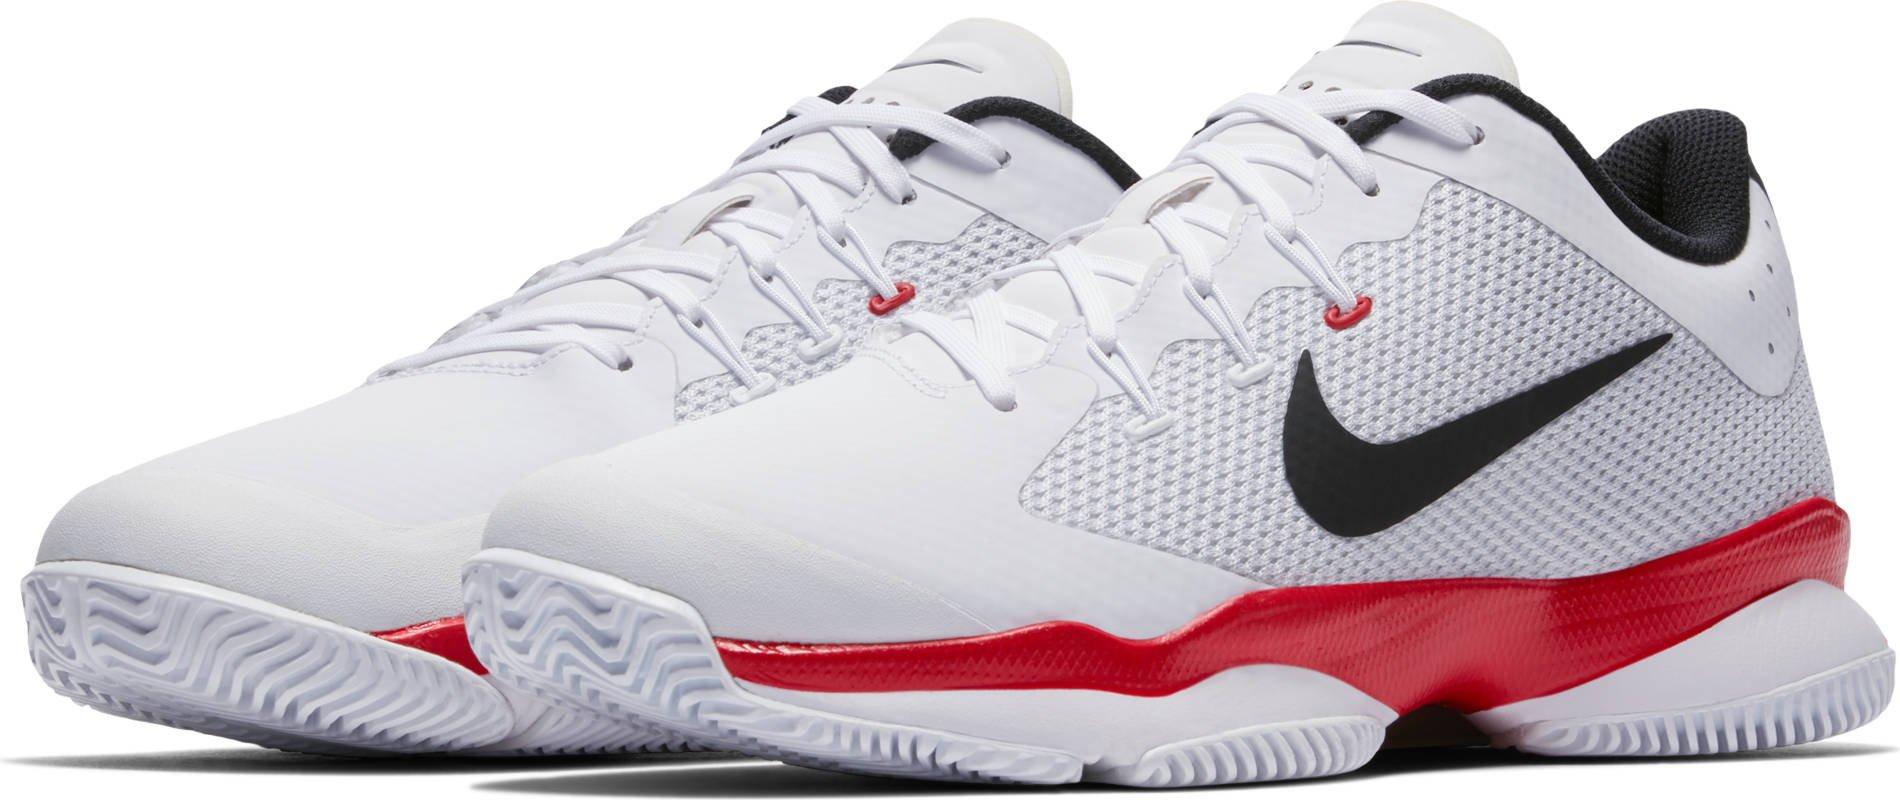 Nike Trainers Shoes Mens Blazer Mid Lr Dark Blue